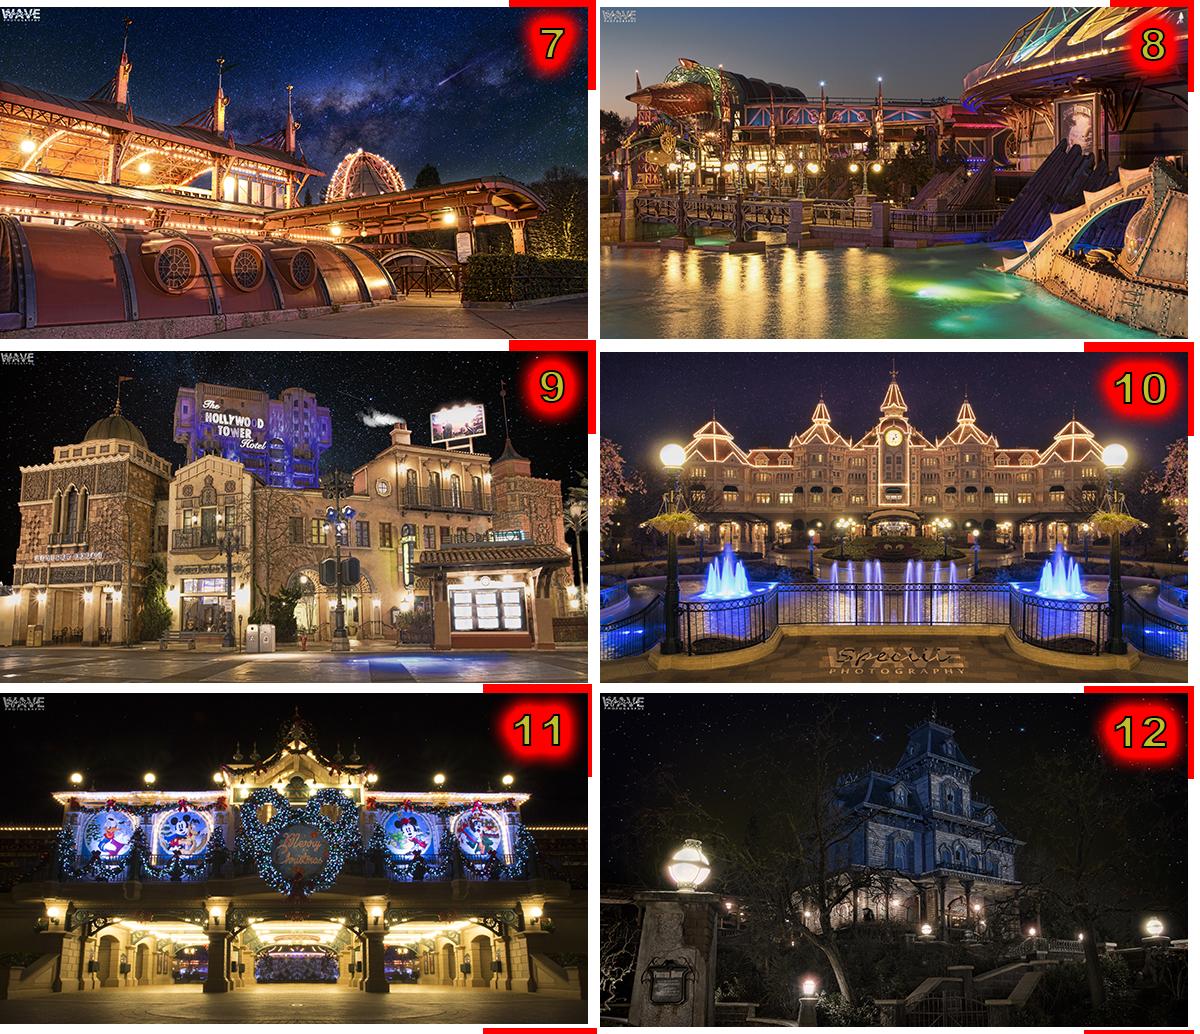 Photos de Disneyland Paris en HDR (High Dynamic Range) ! 170208111157650940